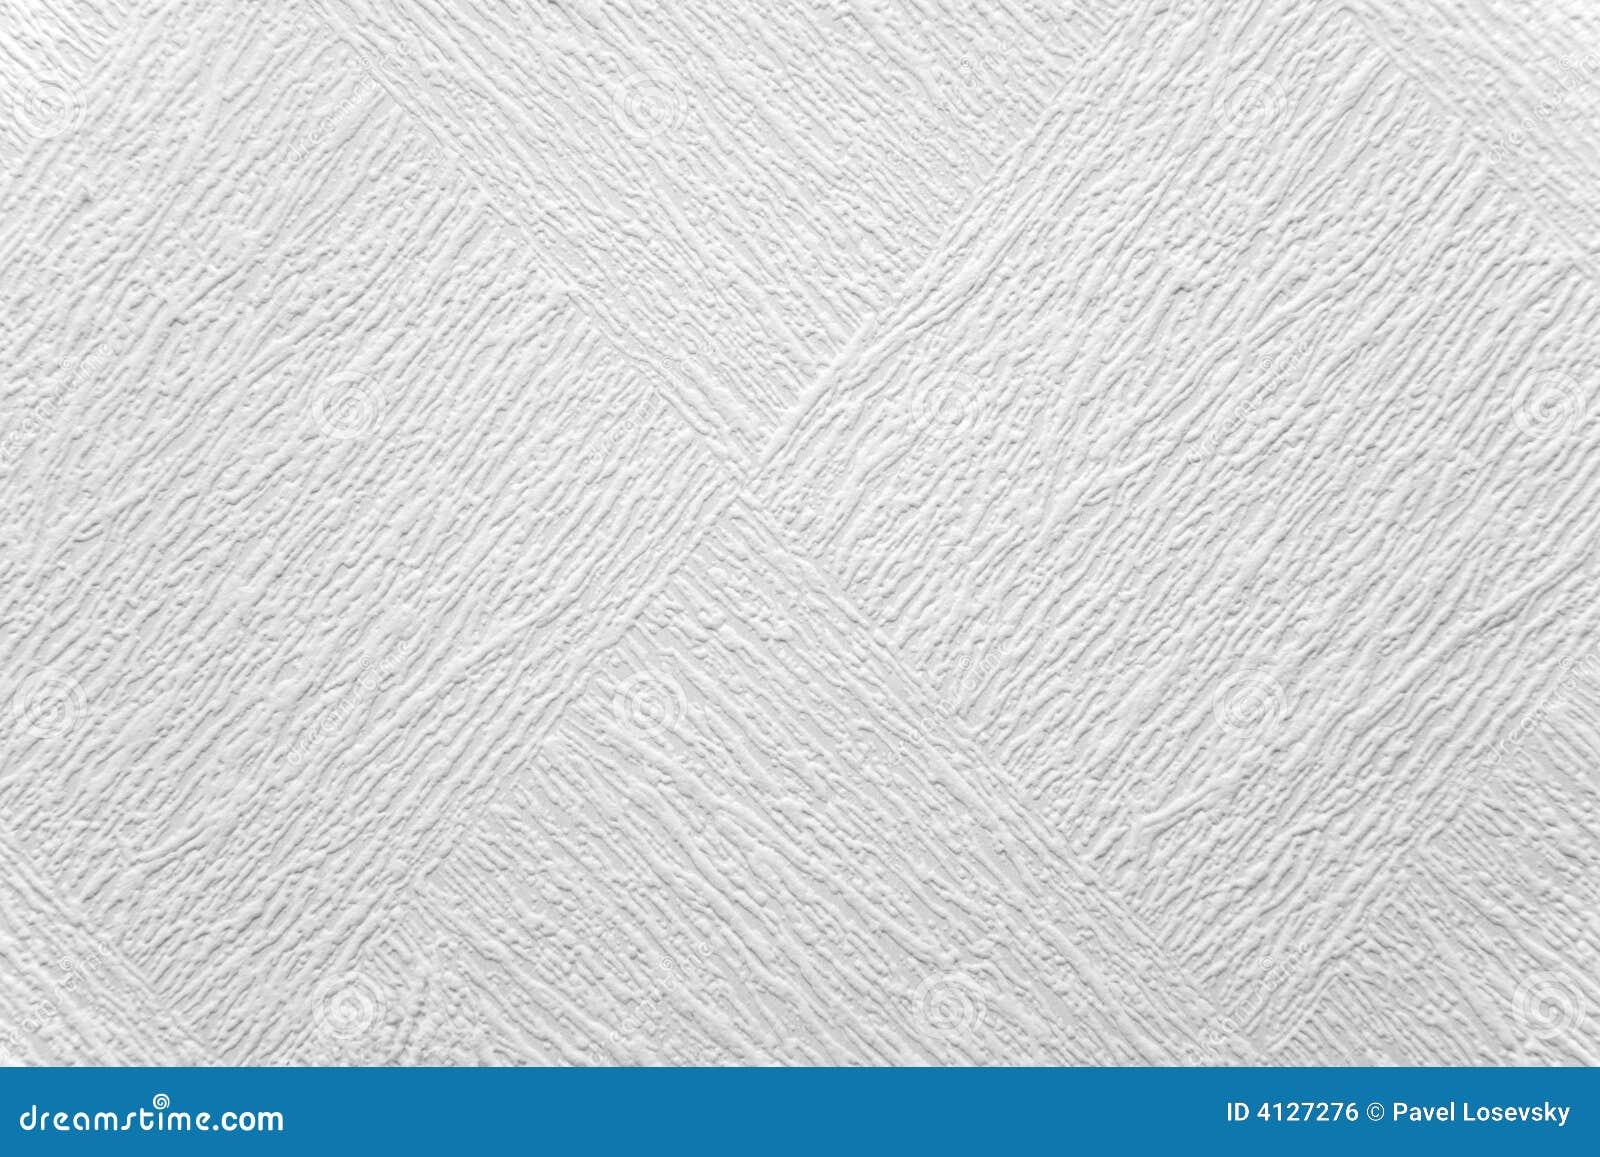 Struttura bianca della carta da parati di rilievo for Carta da parati bianca